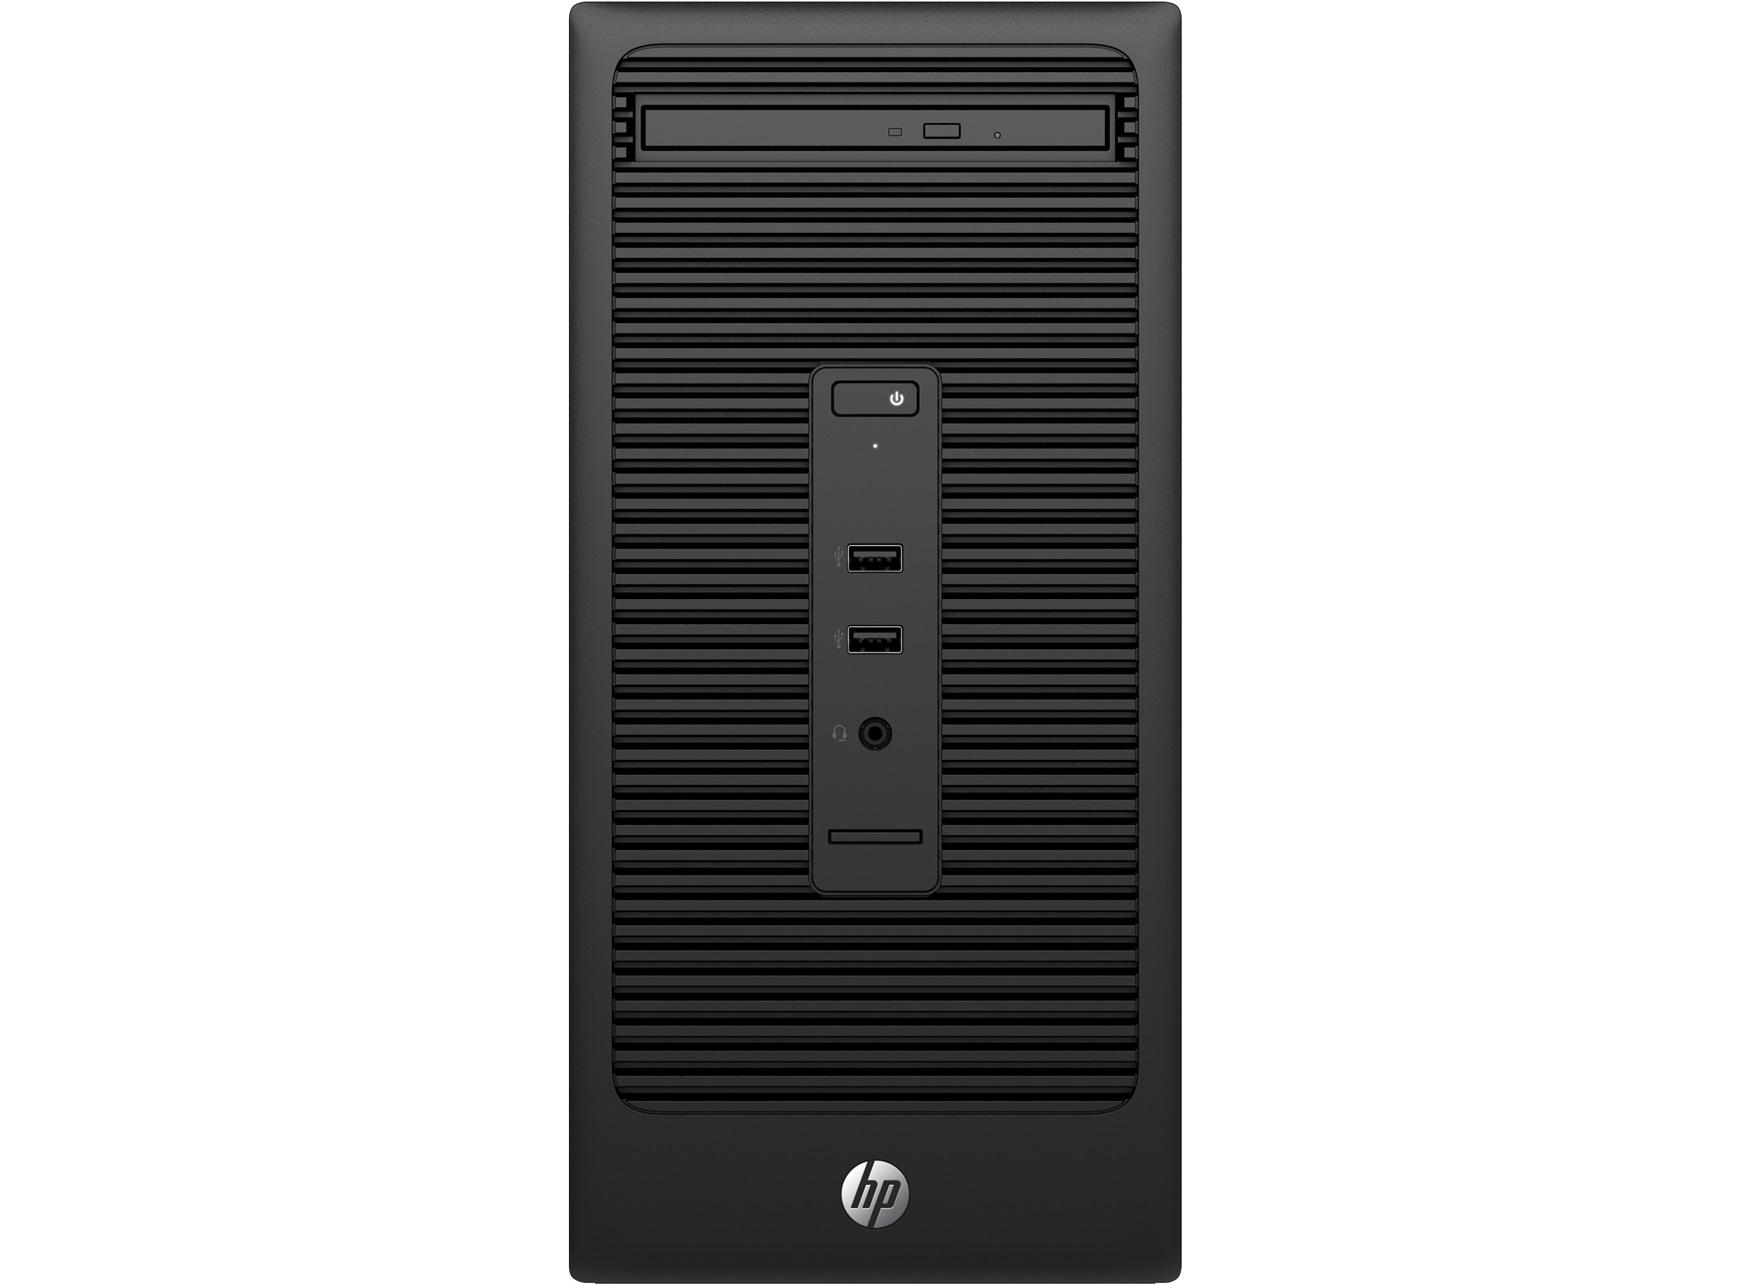 HP ProDesk 280 G2 MT V7Q77EA#ABU Core i3-6100 4GB 500GB DVDRW Win 10 Pro